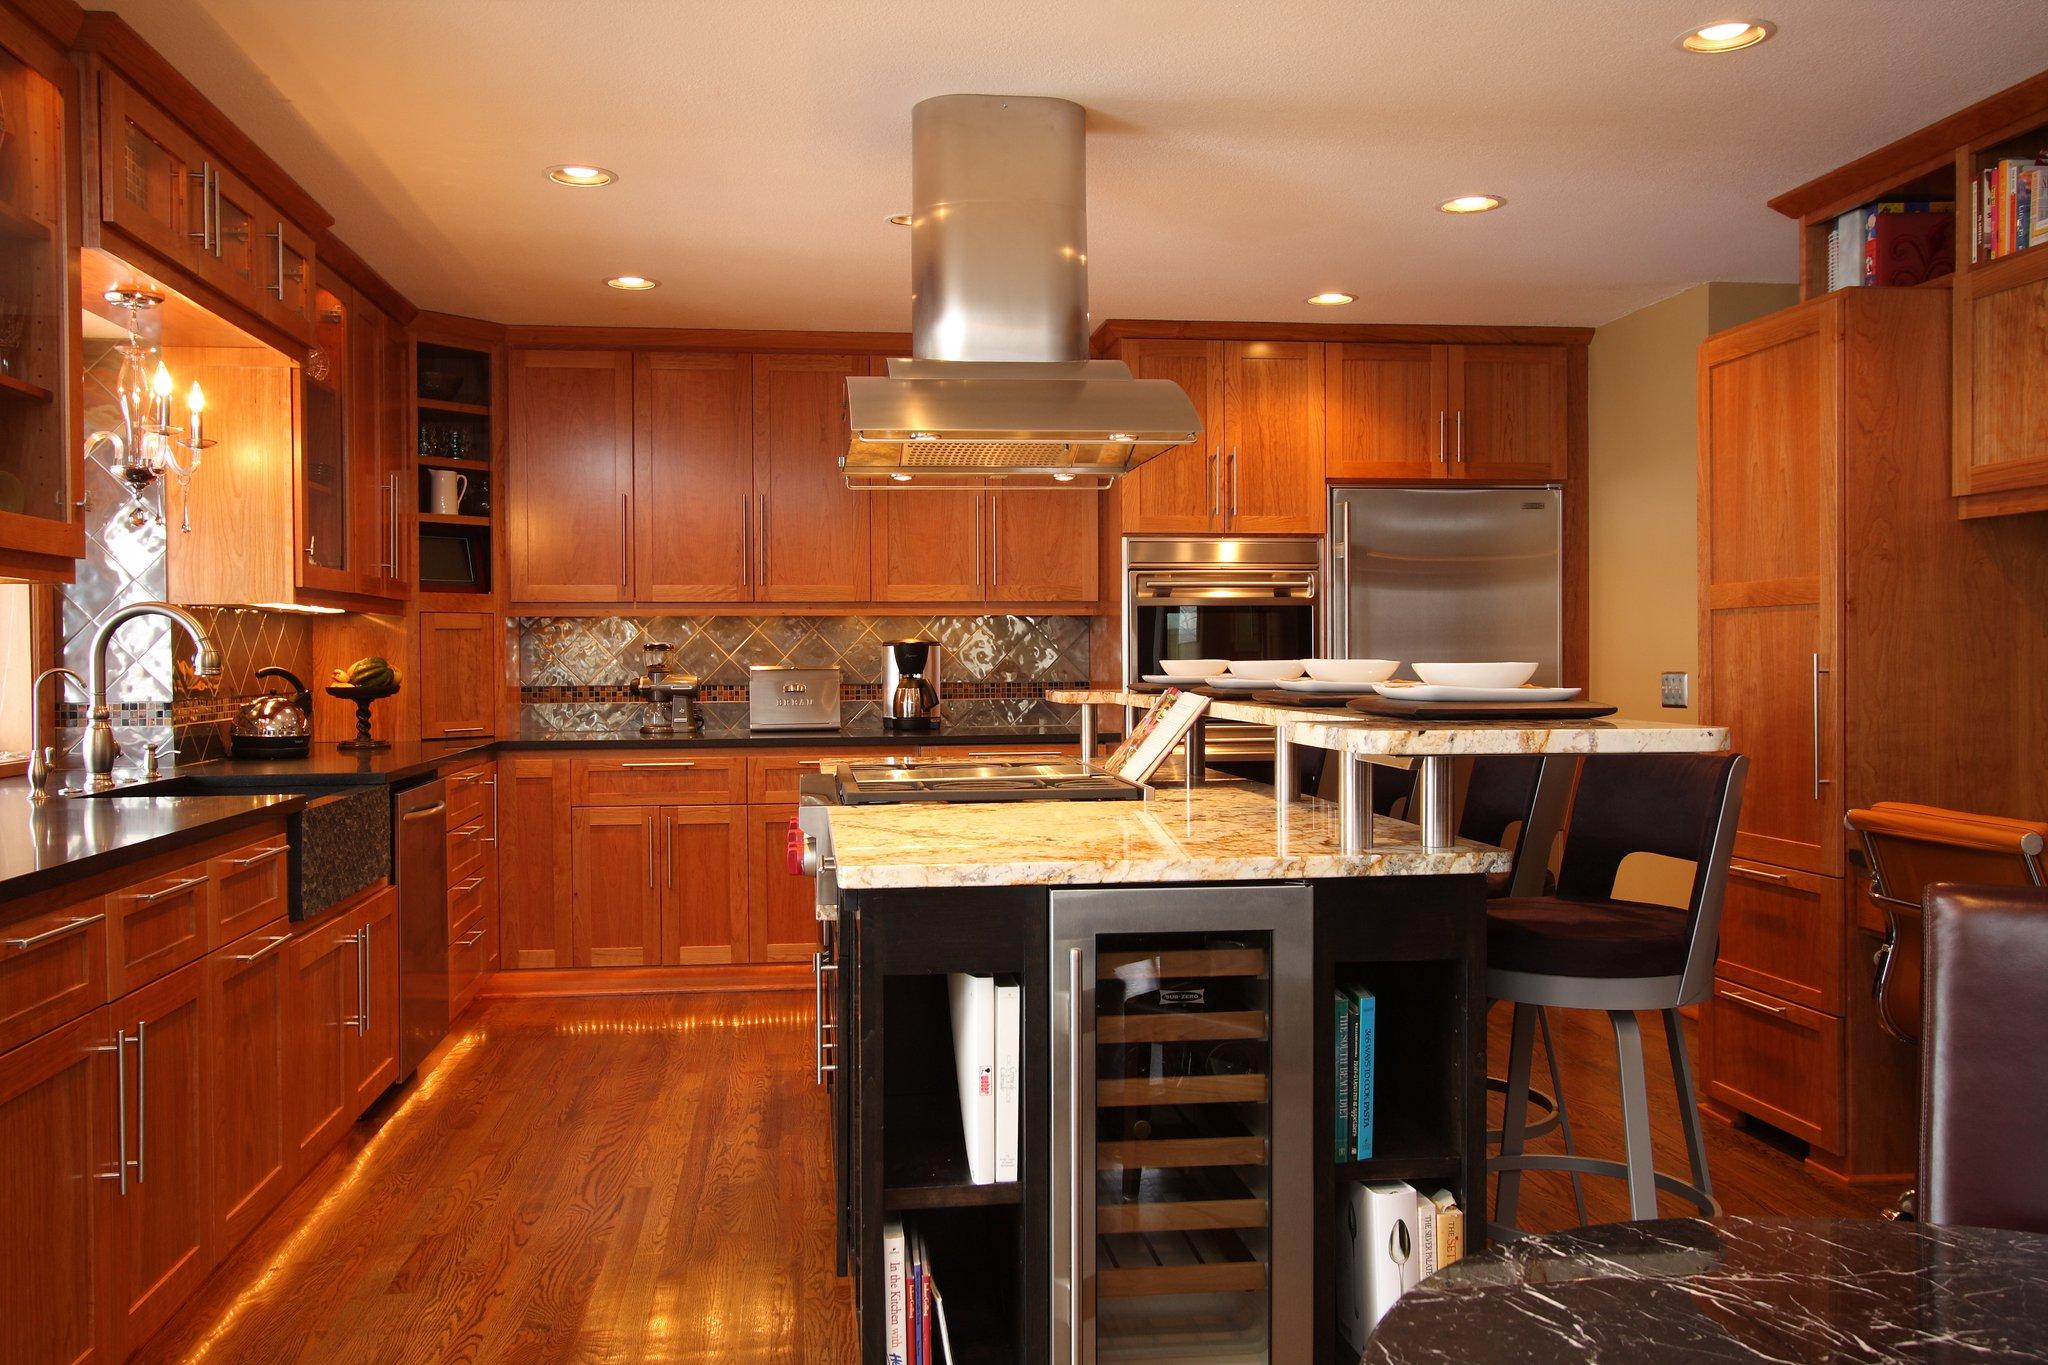 Wholesale Home Decor For Resale